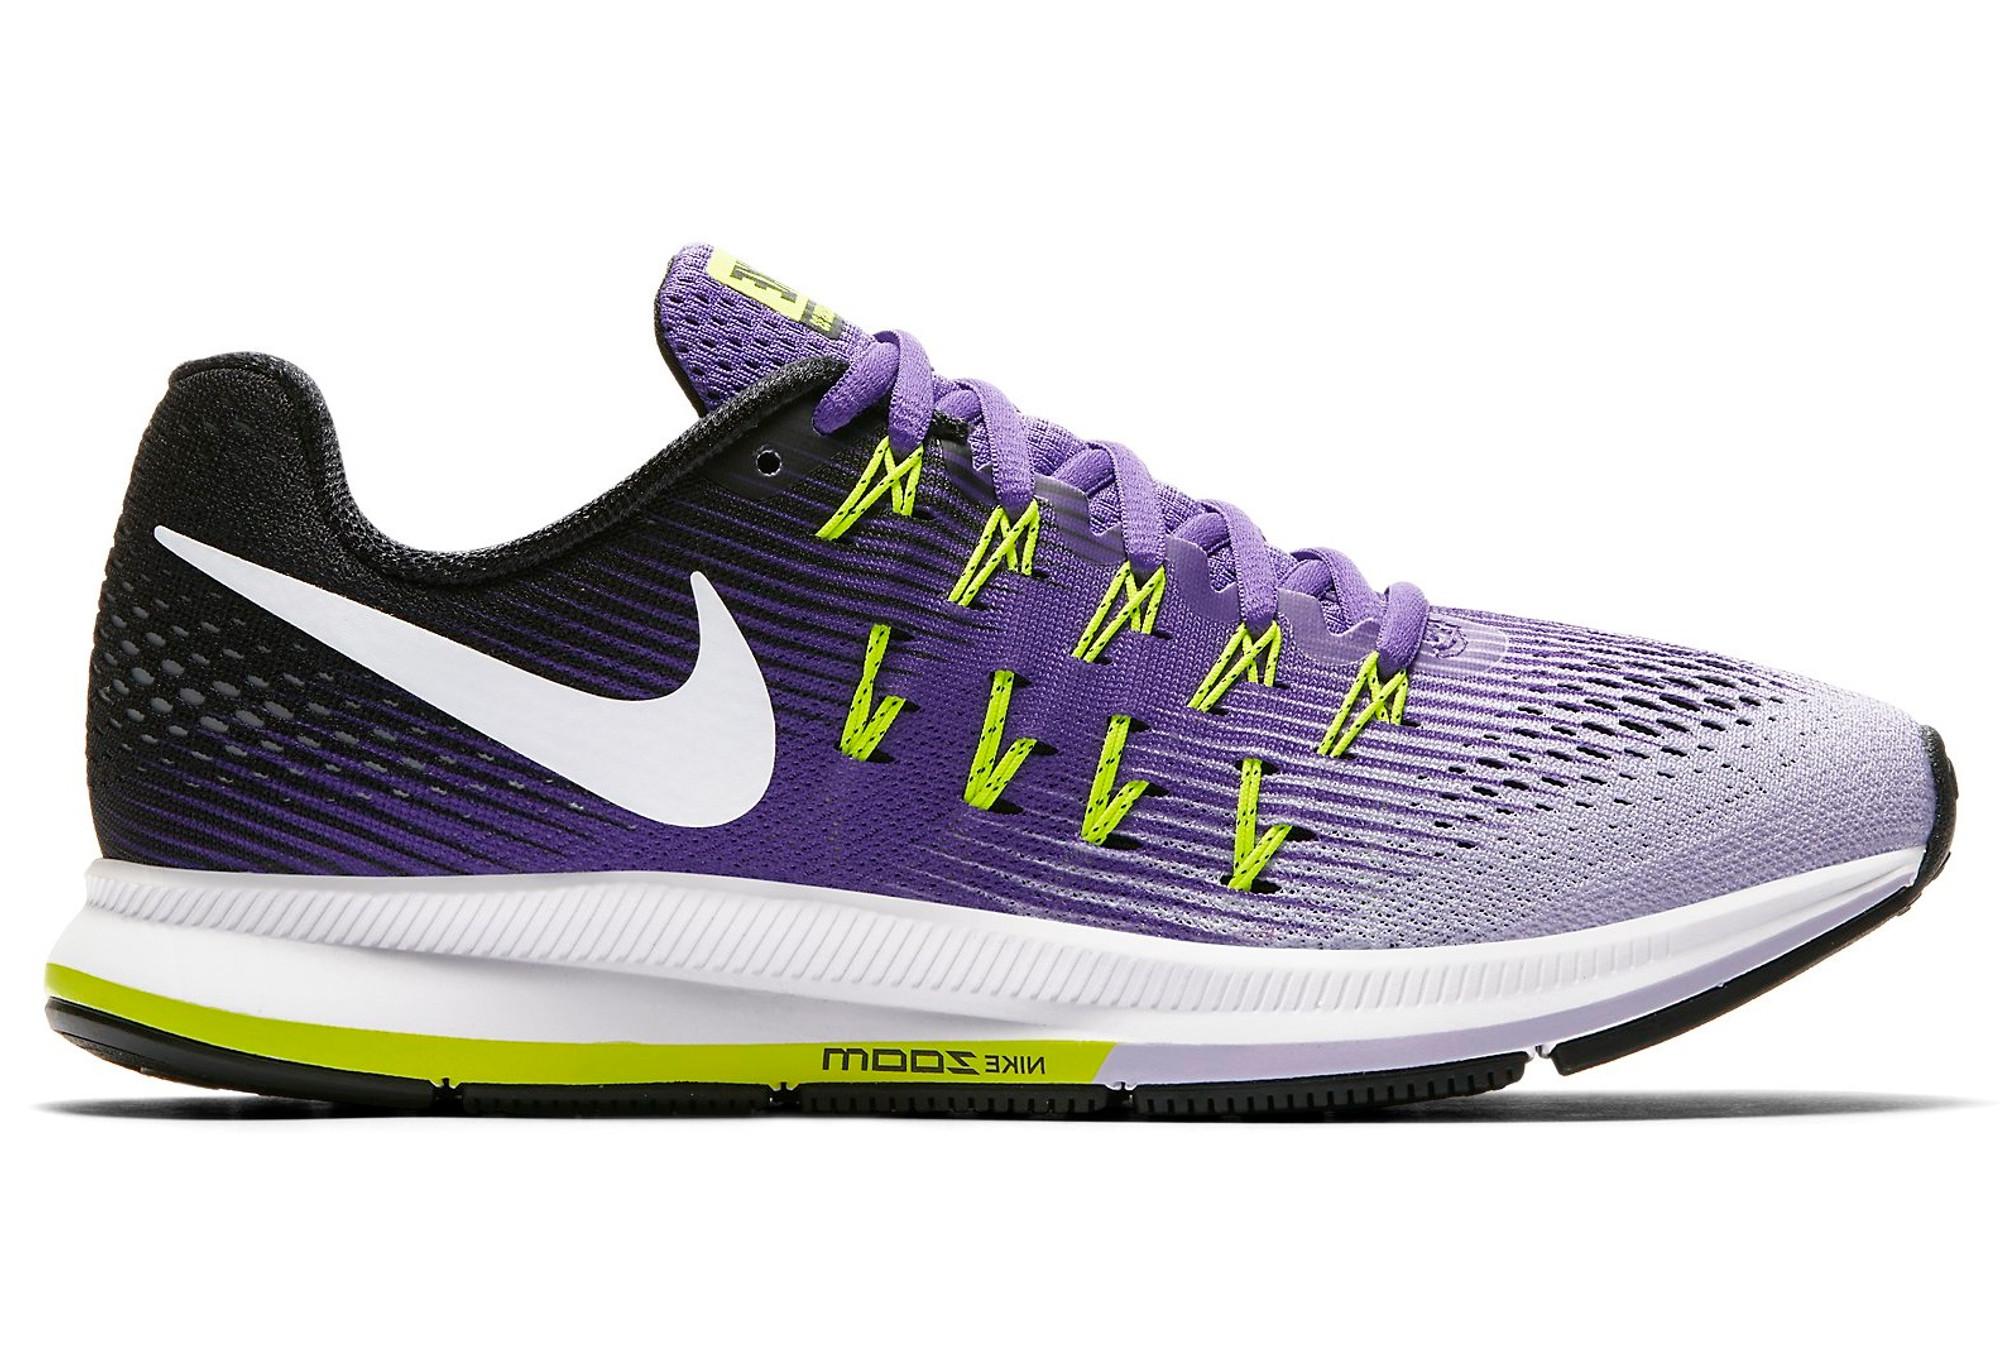 Nike Zoom Pegasus 31, Sneakers Basses Fille - Violet - Purple, 38 EU